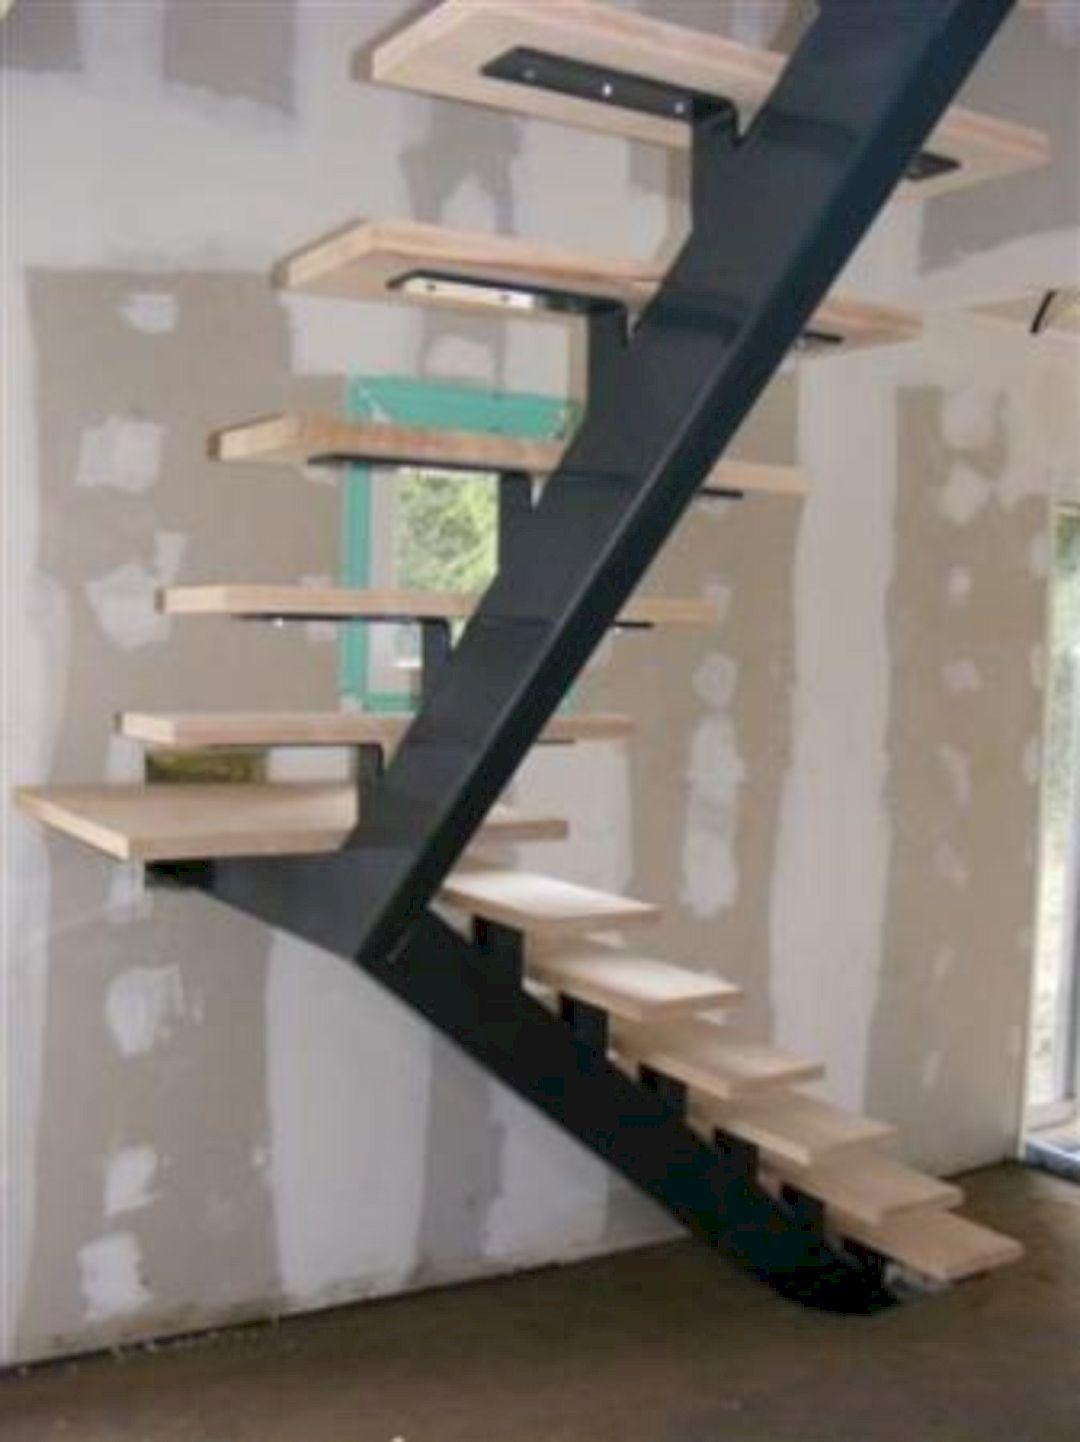 Impressive staircase design inspirations escalera for Escaleras decorativas de interior